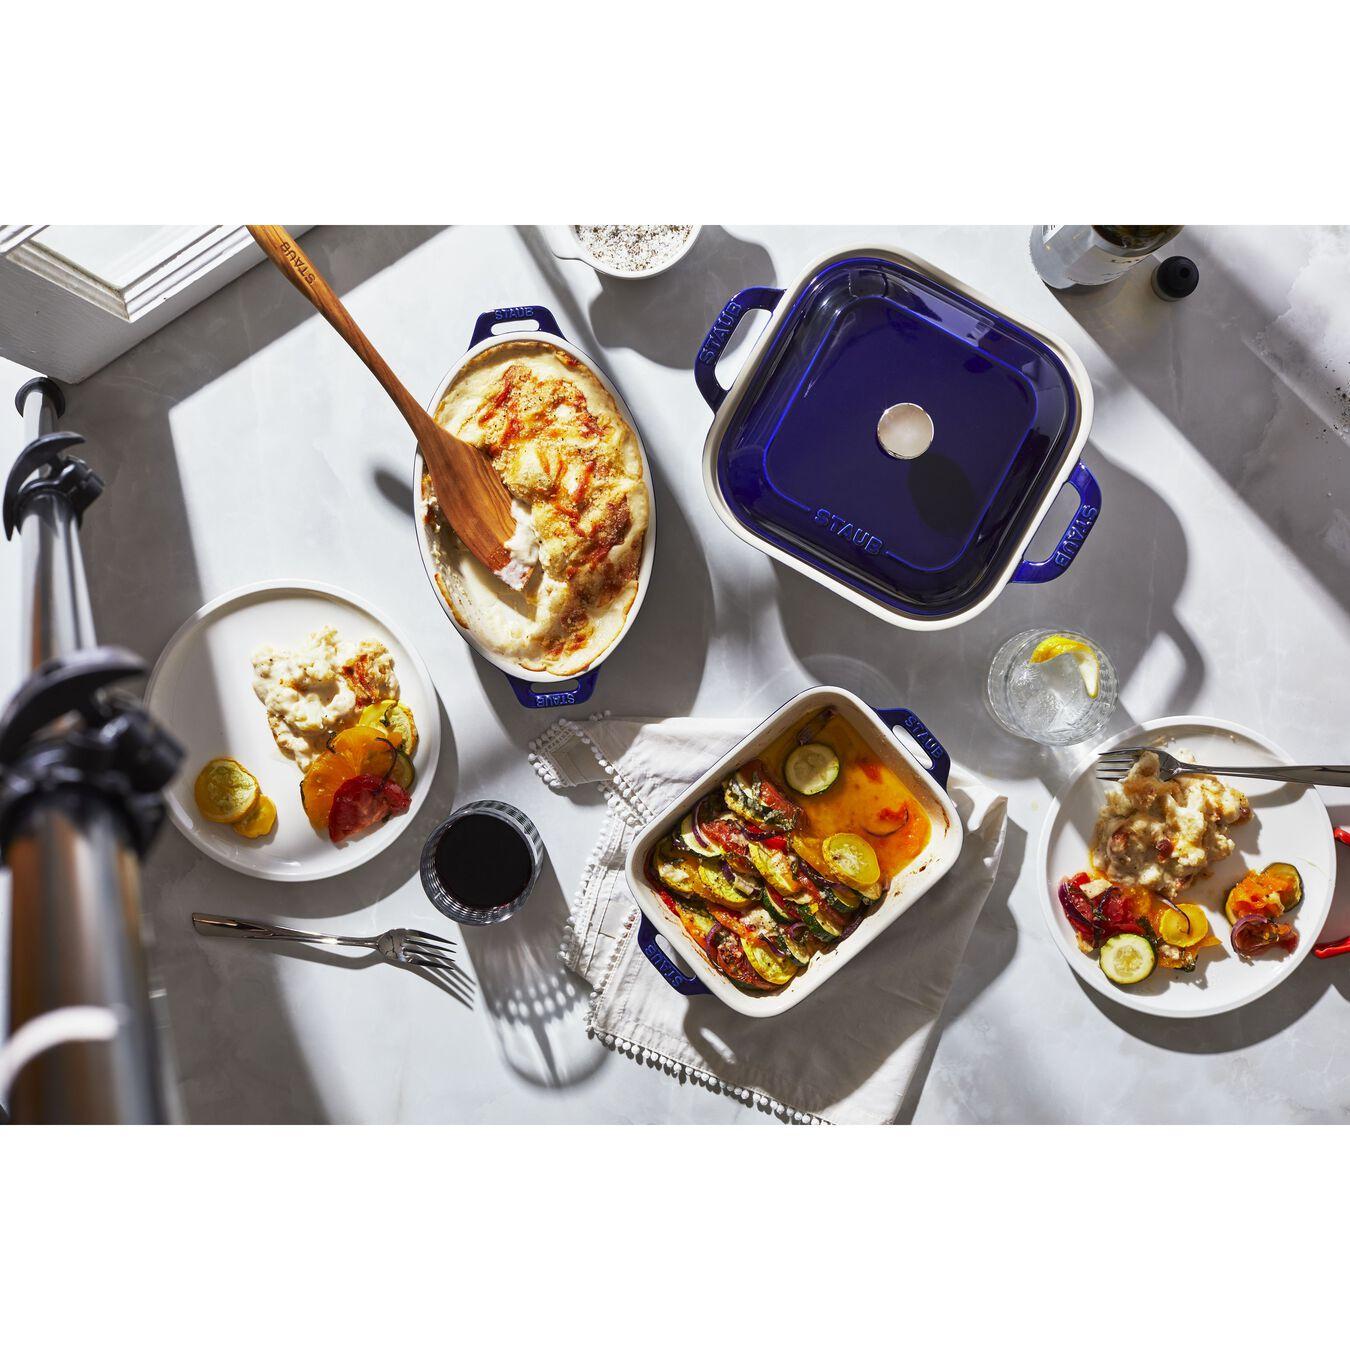 Ovenware set, 4 Piece | dark-blue,,large 8